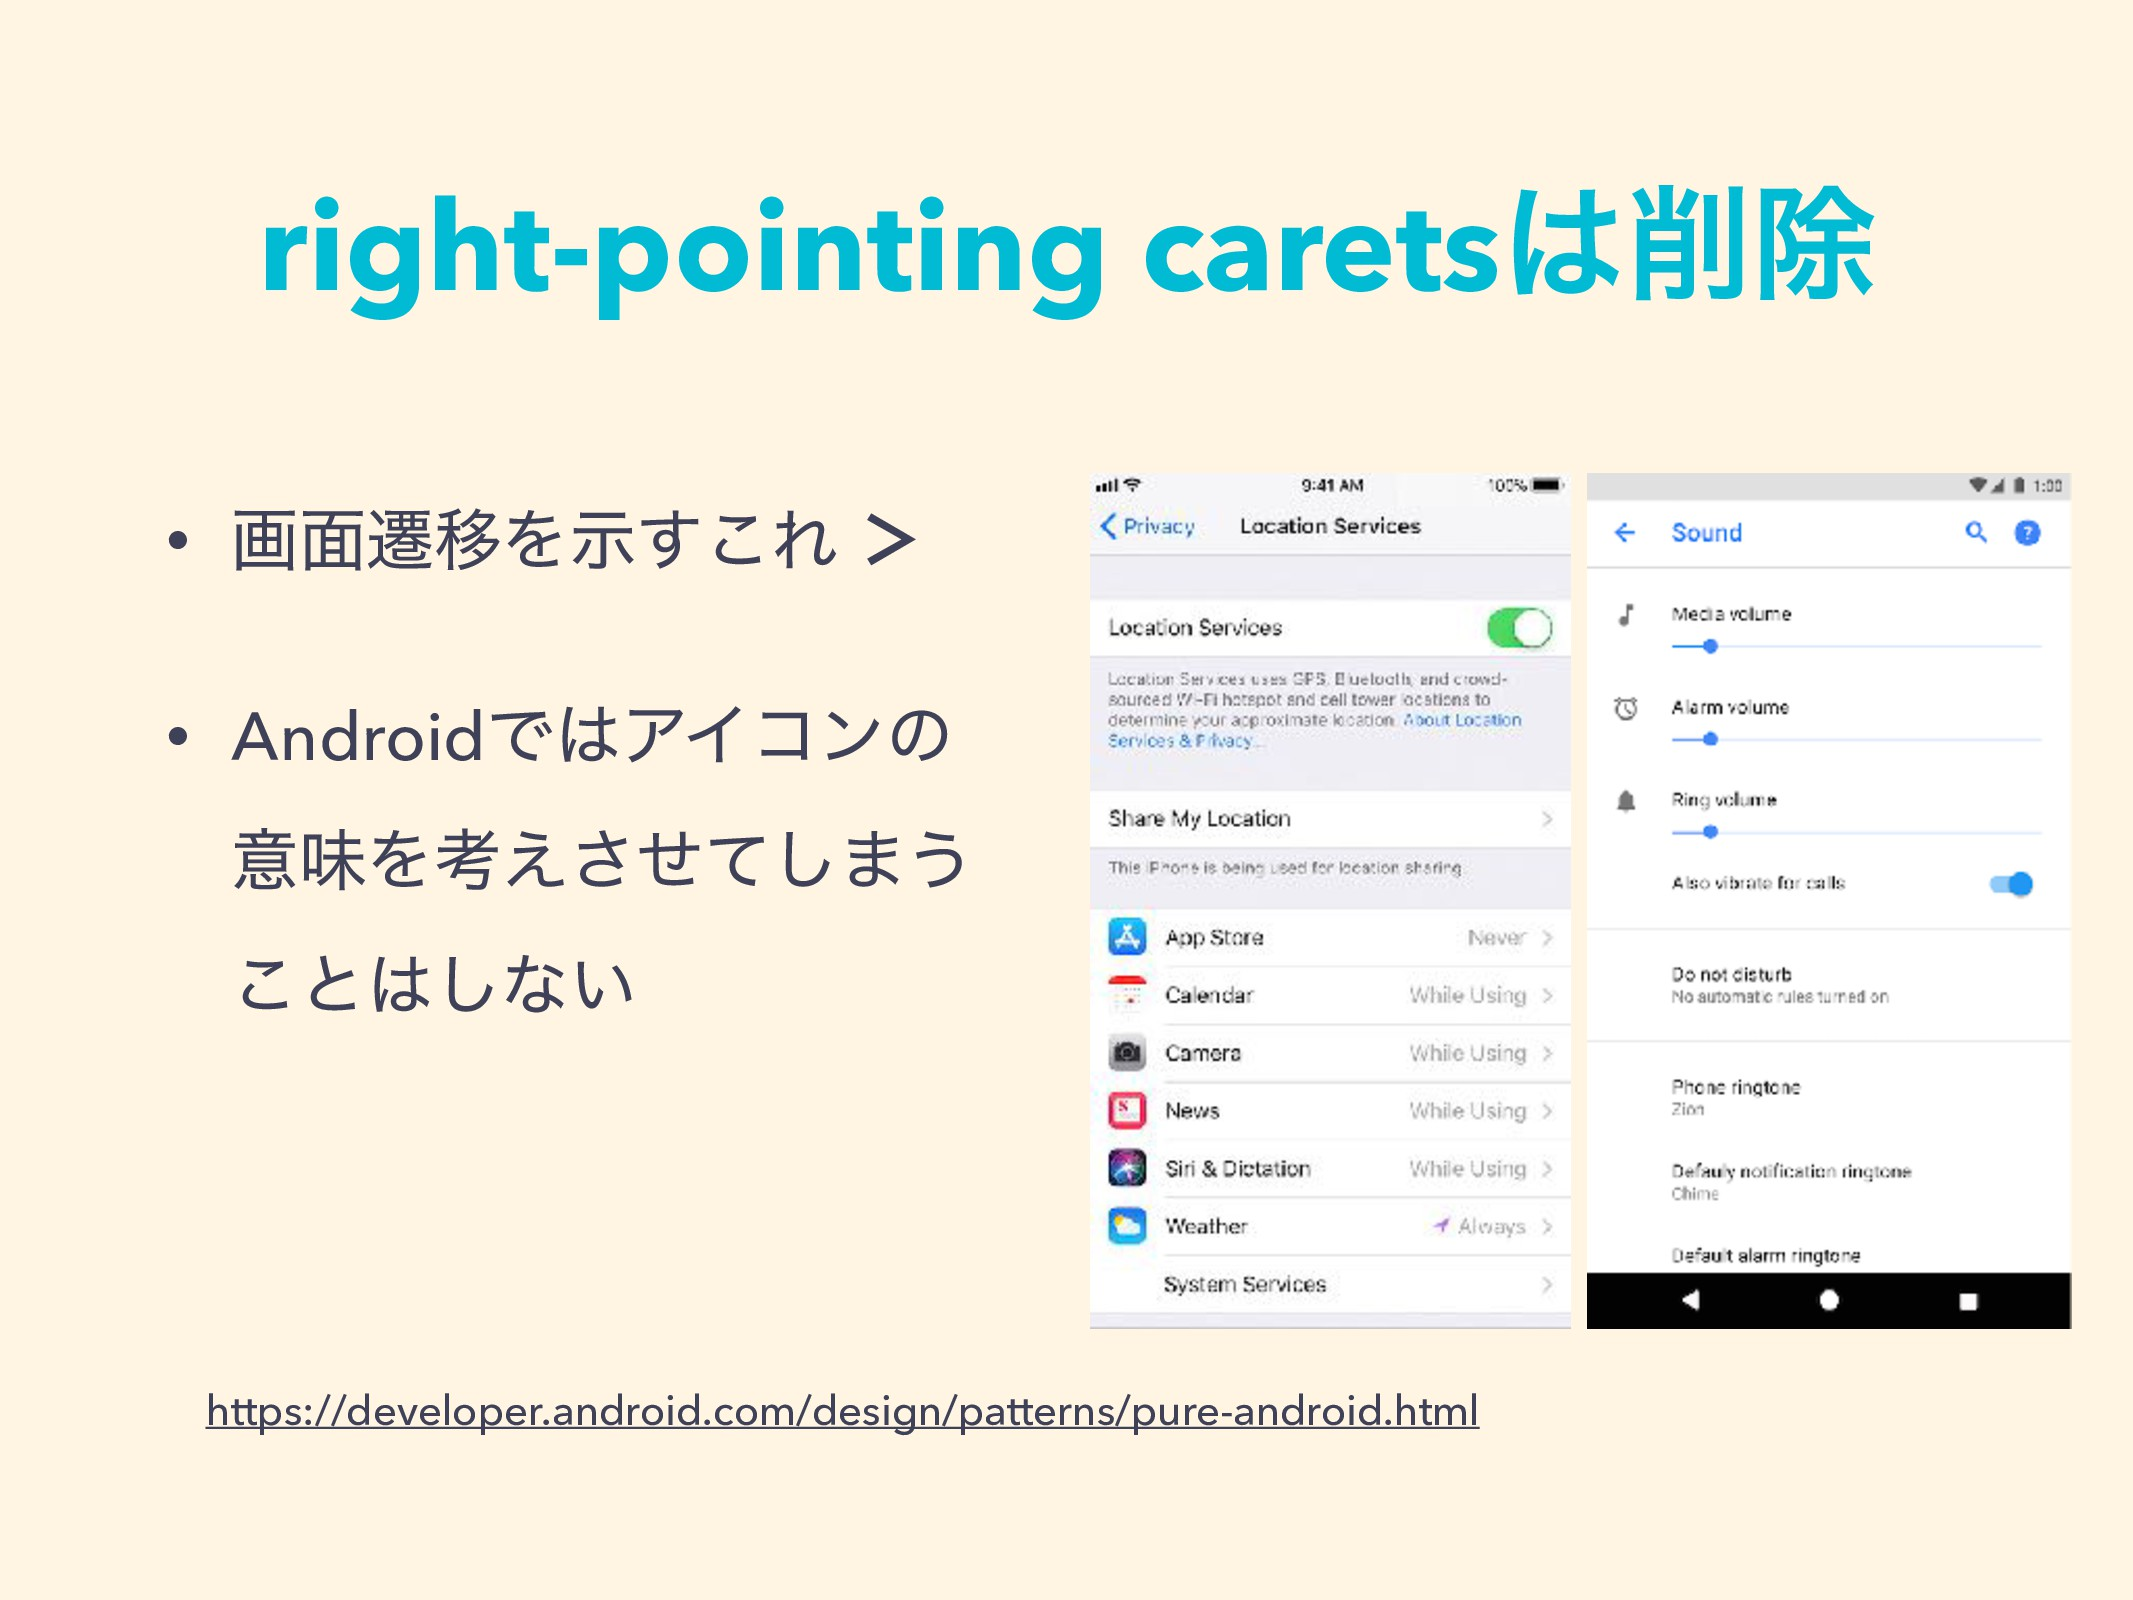 right-pointing caretsআ • ը໘ભҠΛࣔ͢͜Ε ' • Androi...